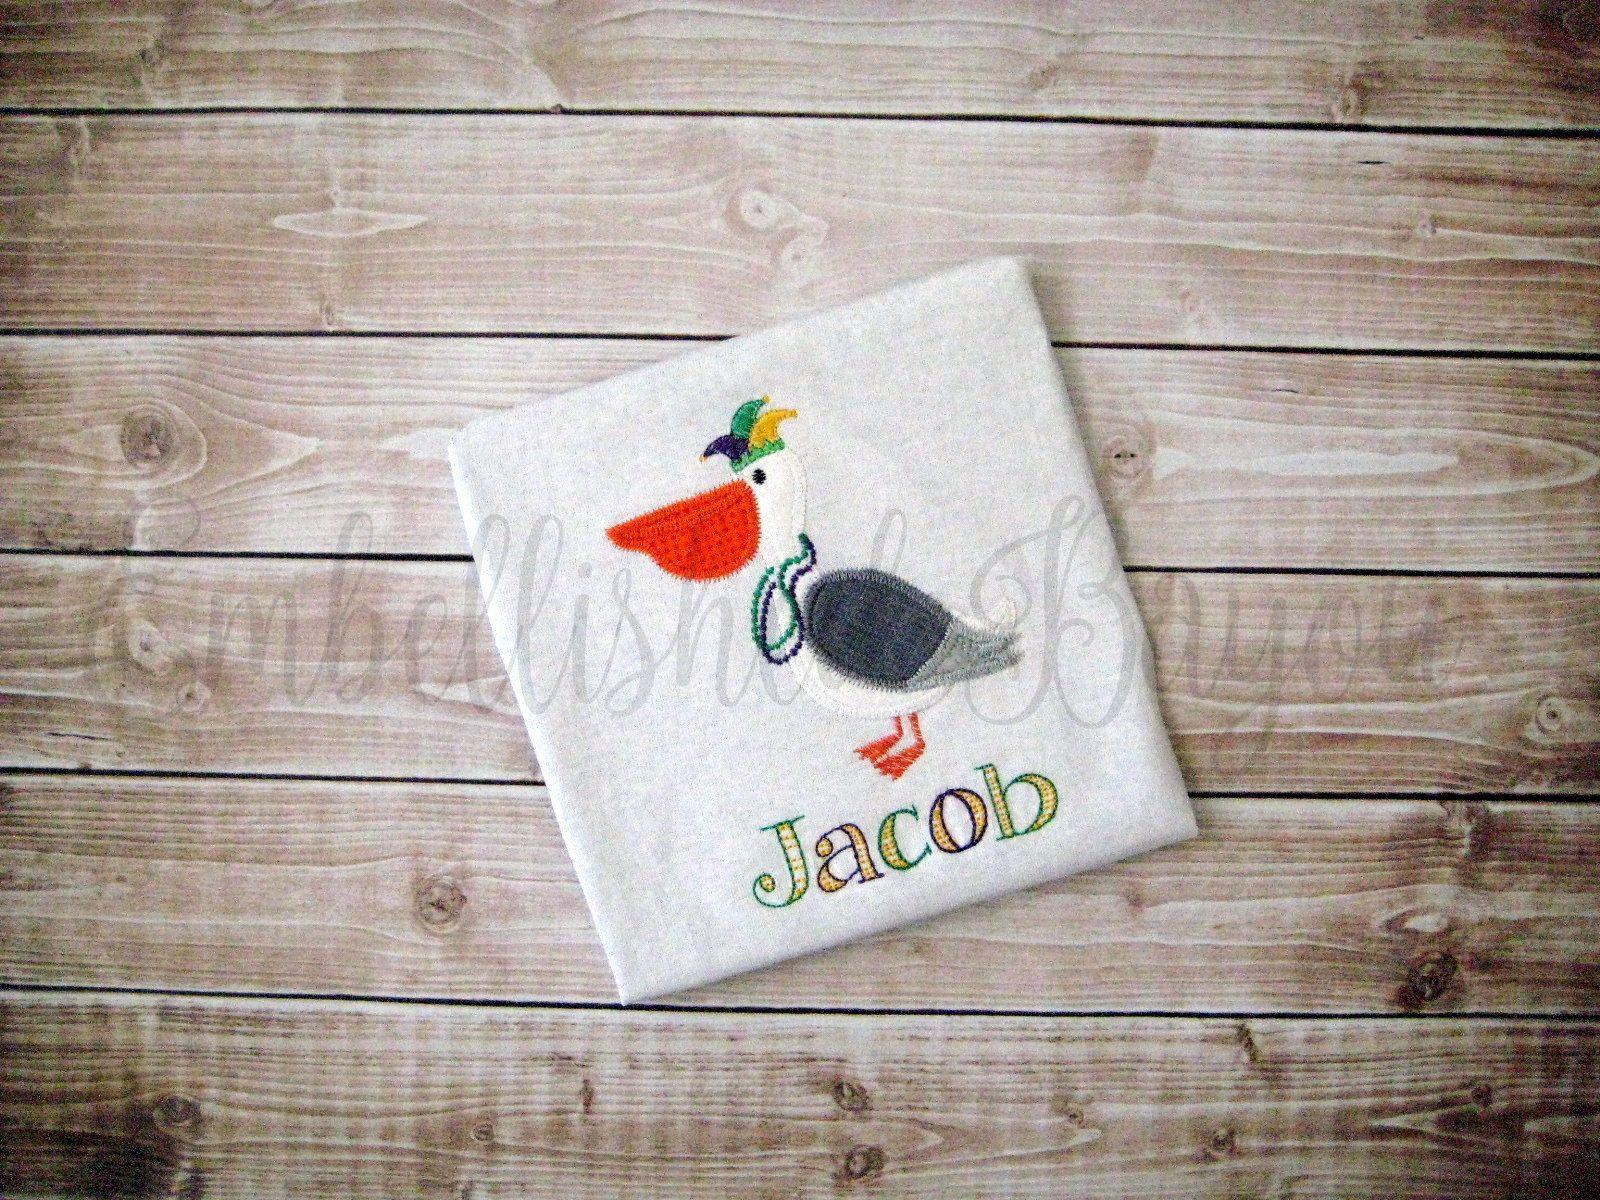 Zigzag stitch mardi gras pelican applique personalized onesie or t